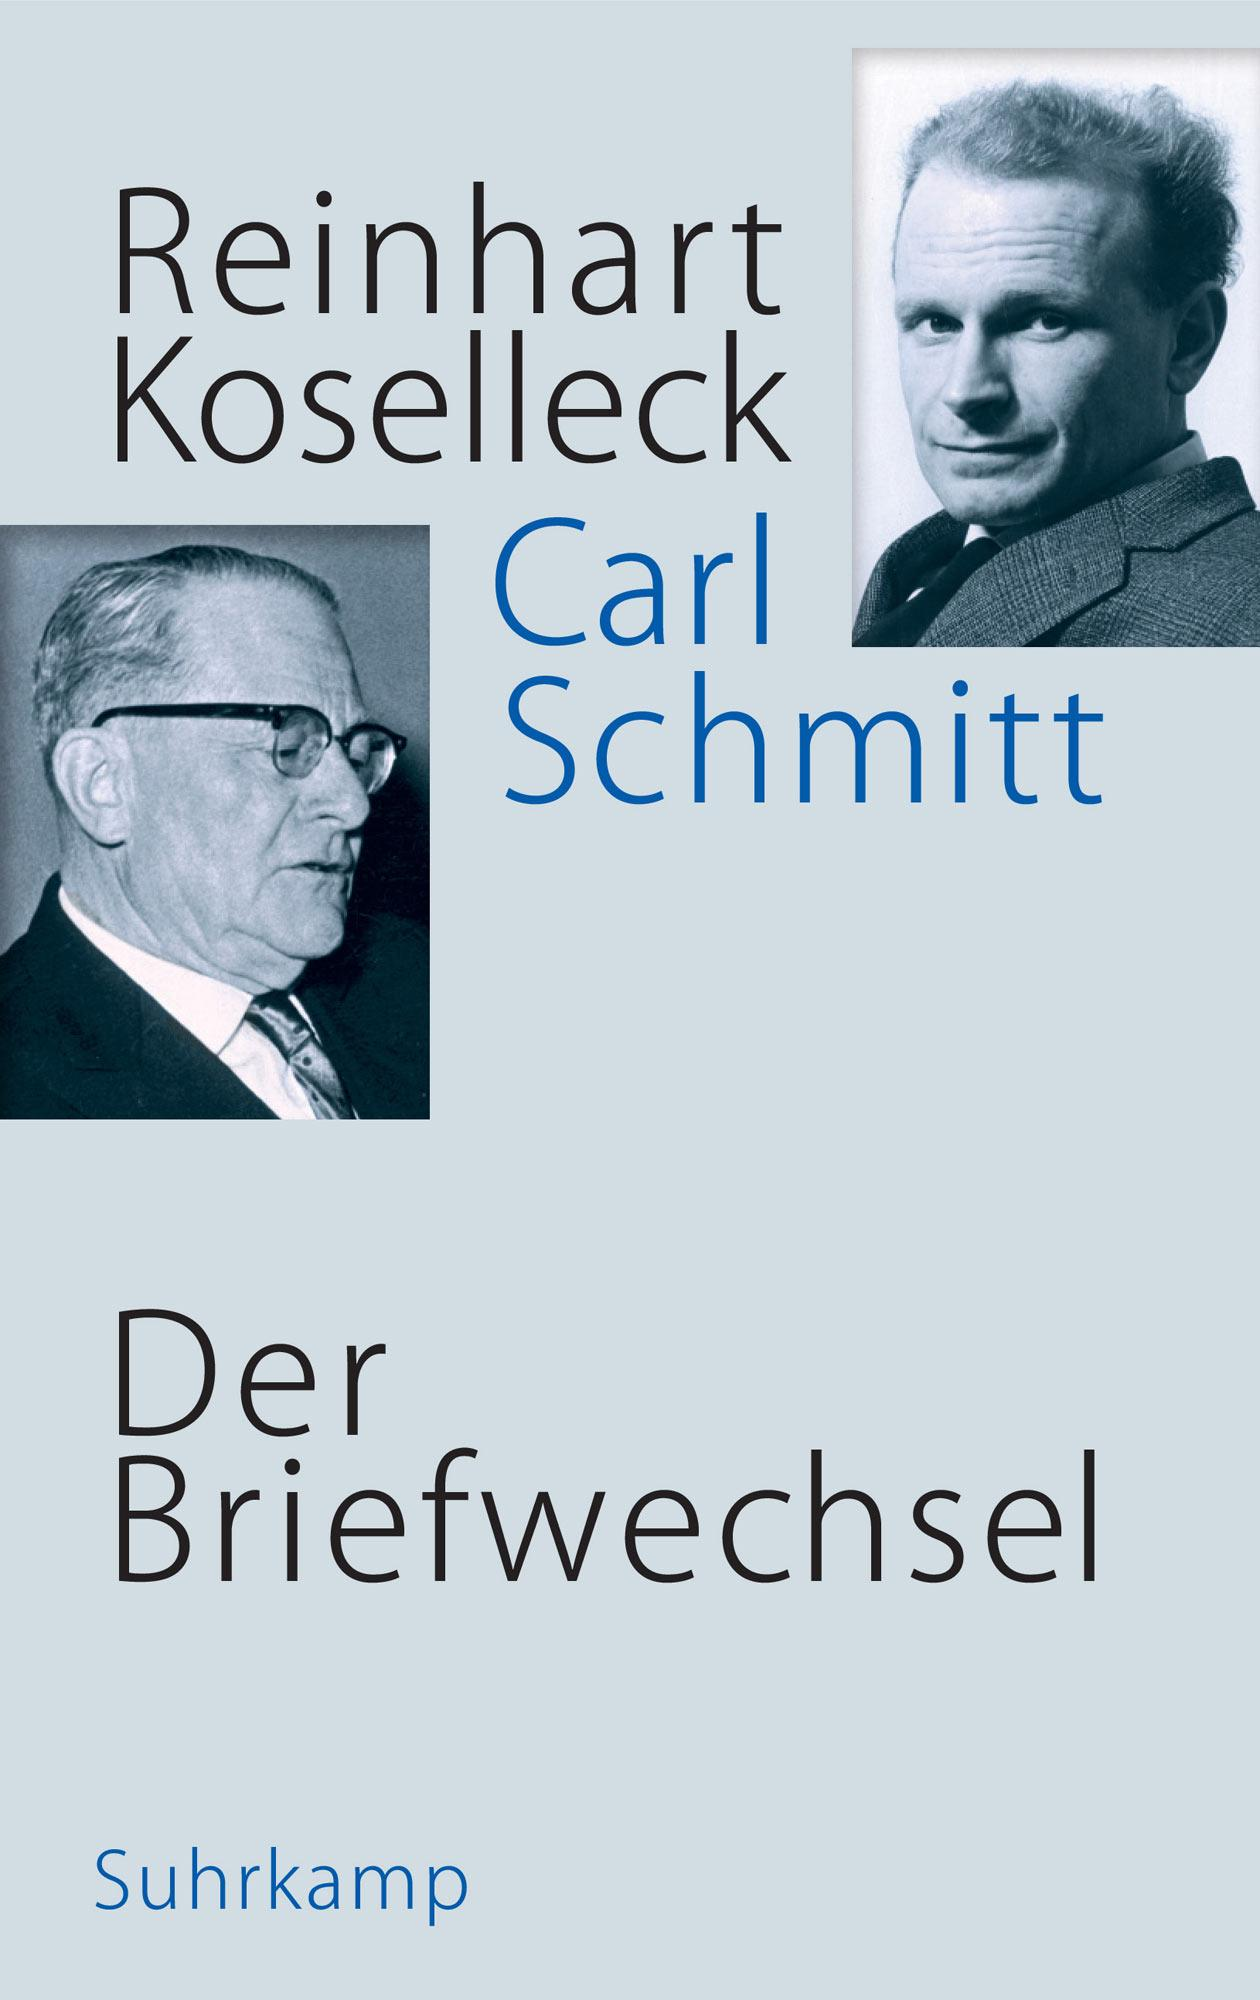 Leseempfehlungen:Reinhart Koselleck, Carl Schmitt: Der Briefwechsel 1953–1983